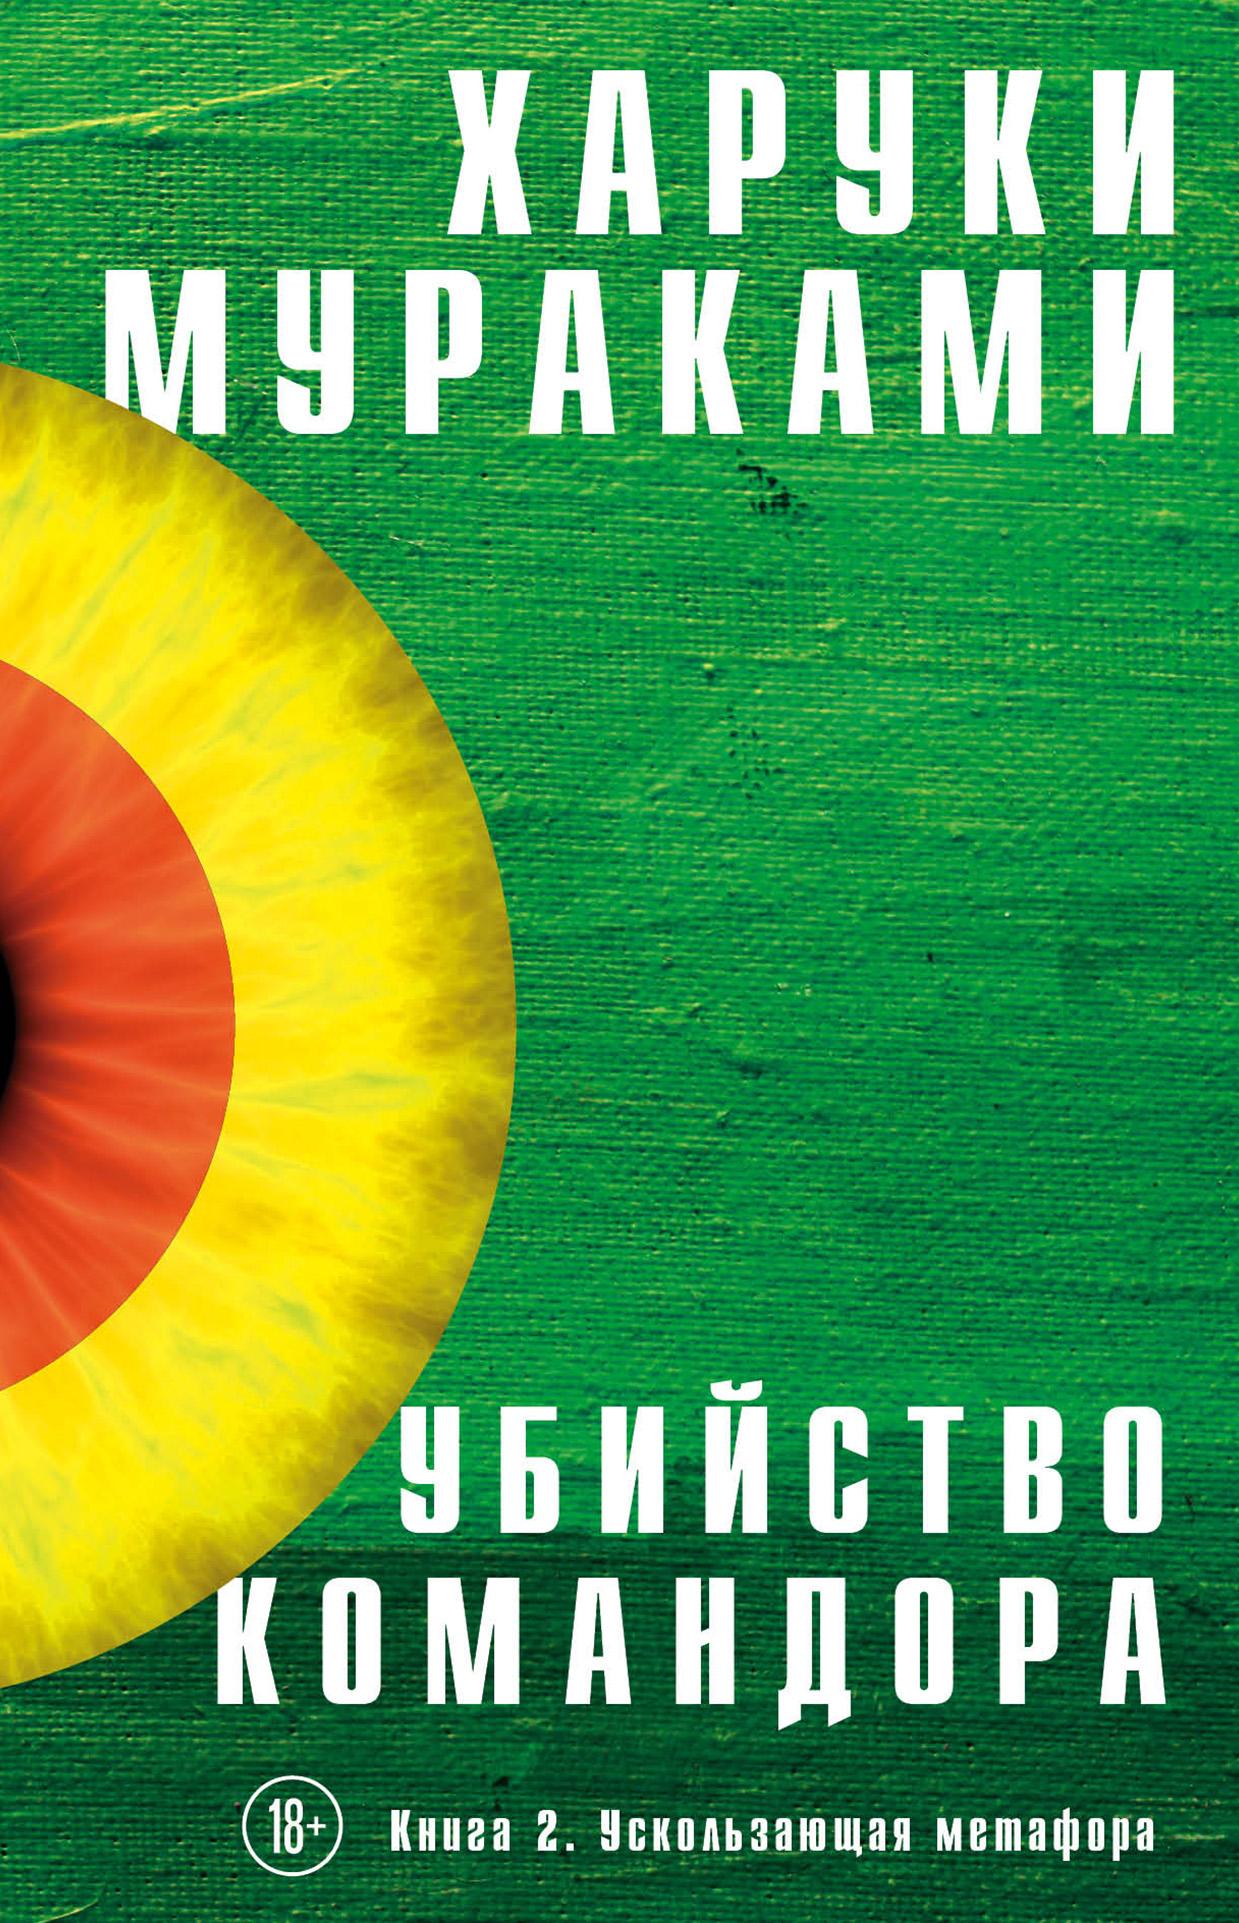 Харуки Мураками - Убийство Командора. Книга 2. Ускользающая метафора